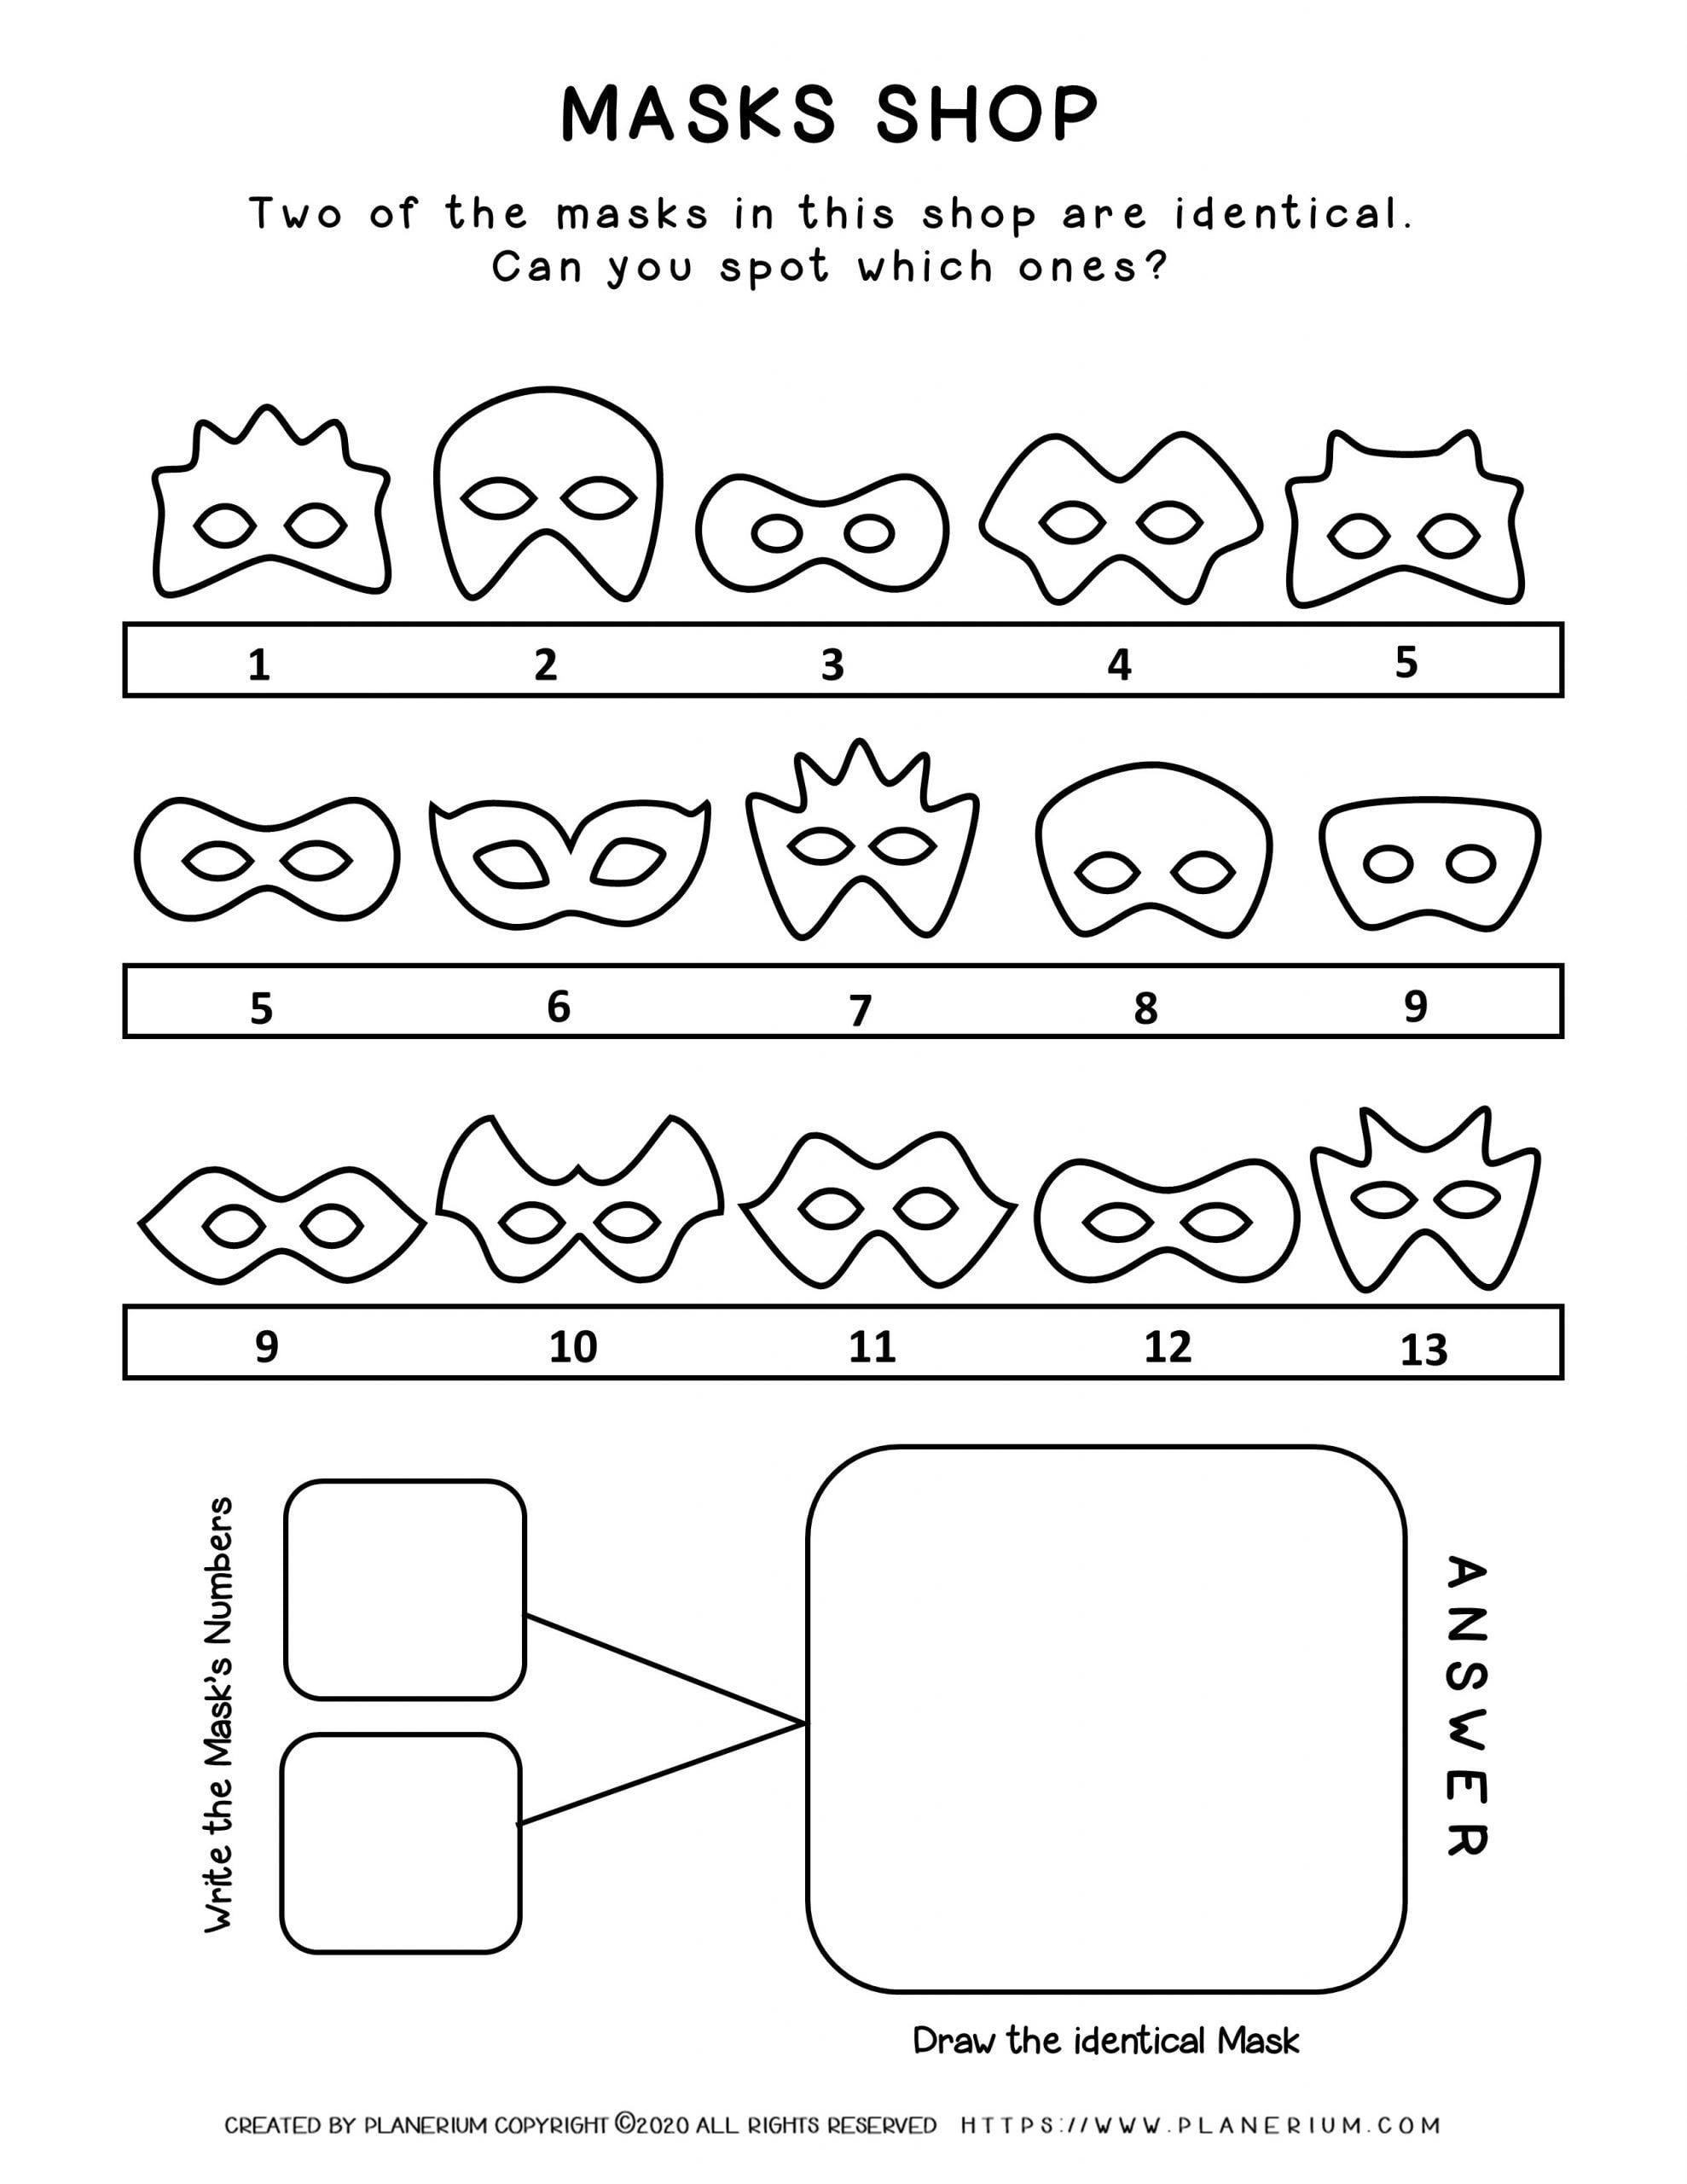 Carnival - Coloring Pages Worksheets - Masks Shop | Planerium